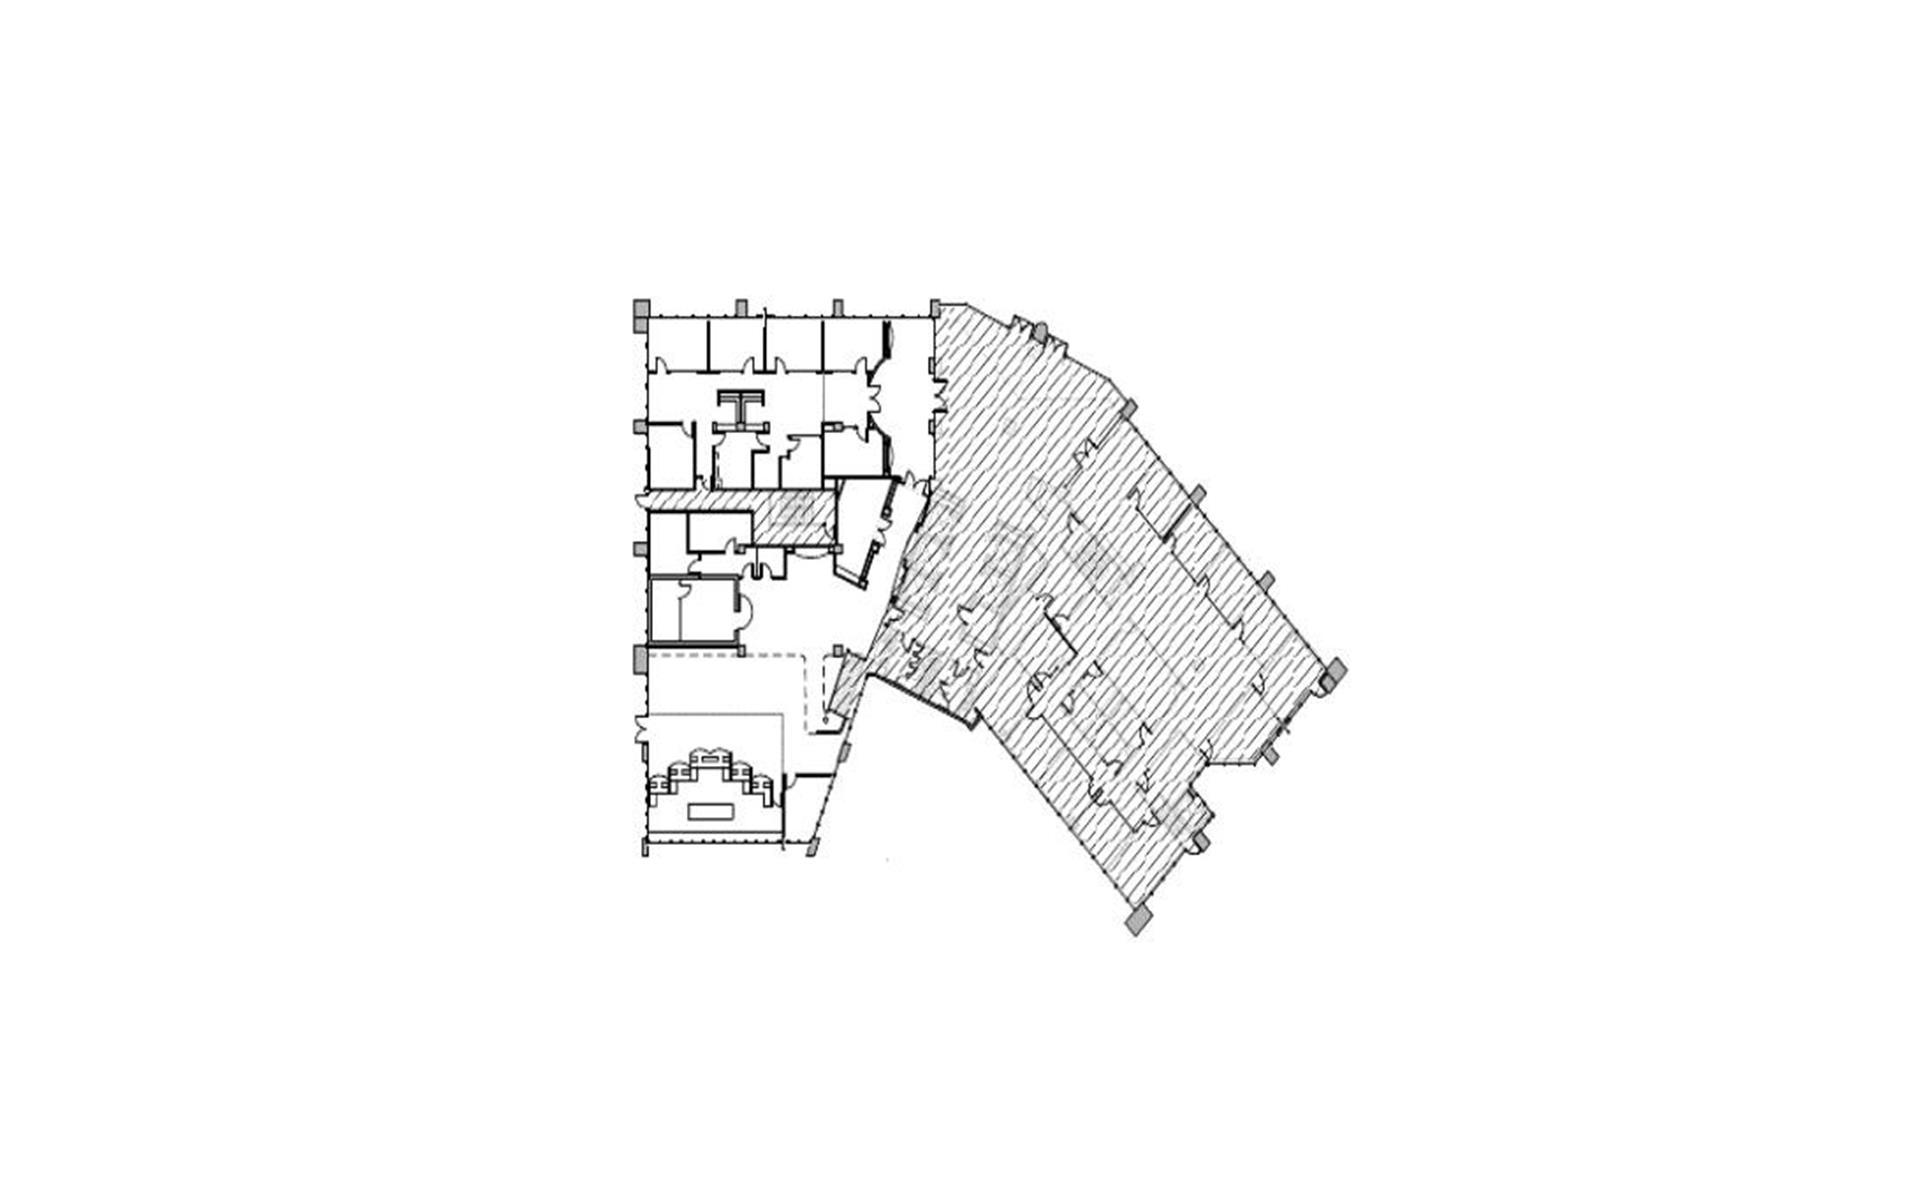 Boxer - CBIZ Plaza - Team Space   Suite 100.02